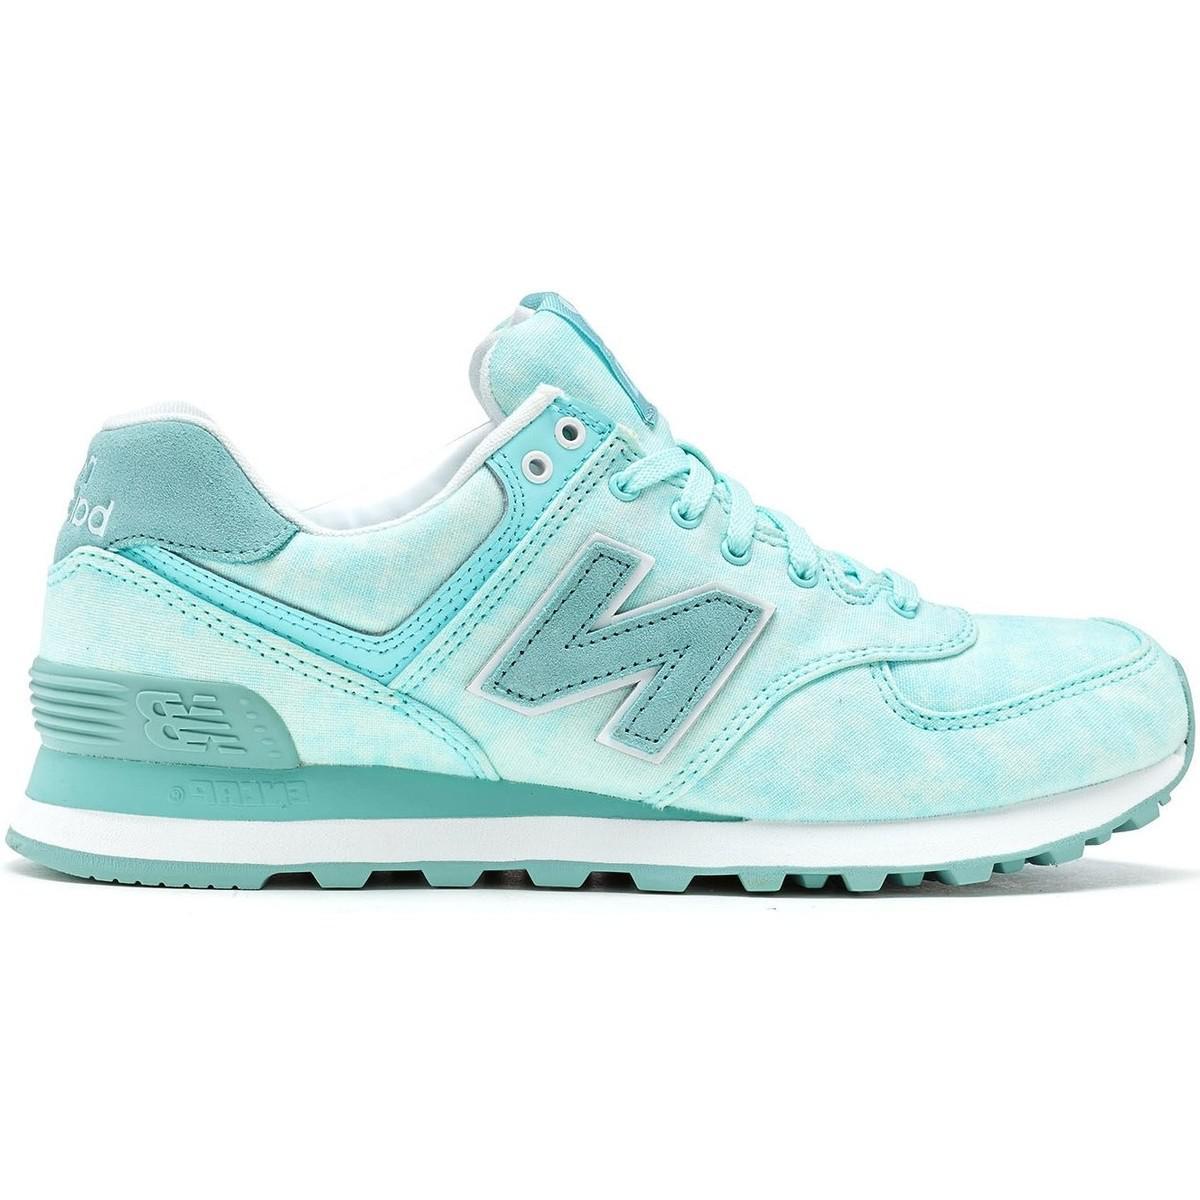 New Balance. 574 Retro Women Trainers In Light Blue Wl574 Swb ...